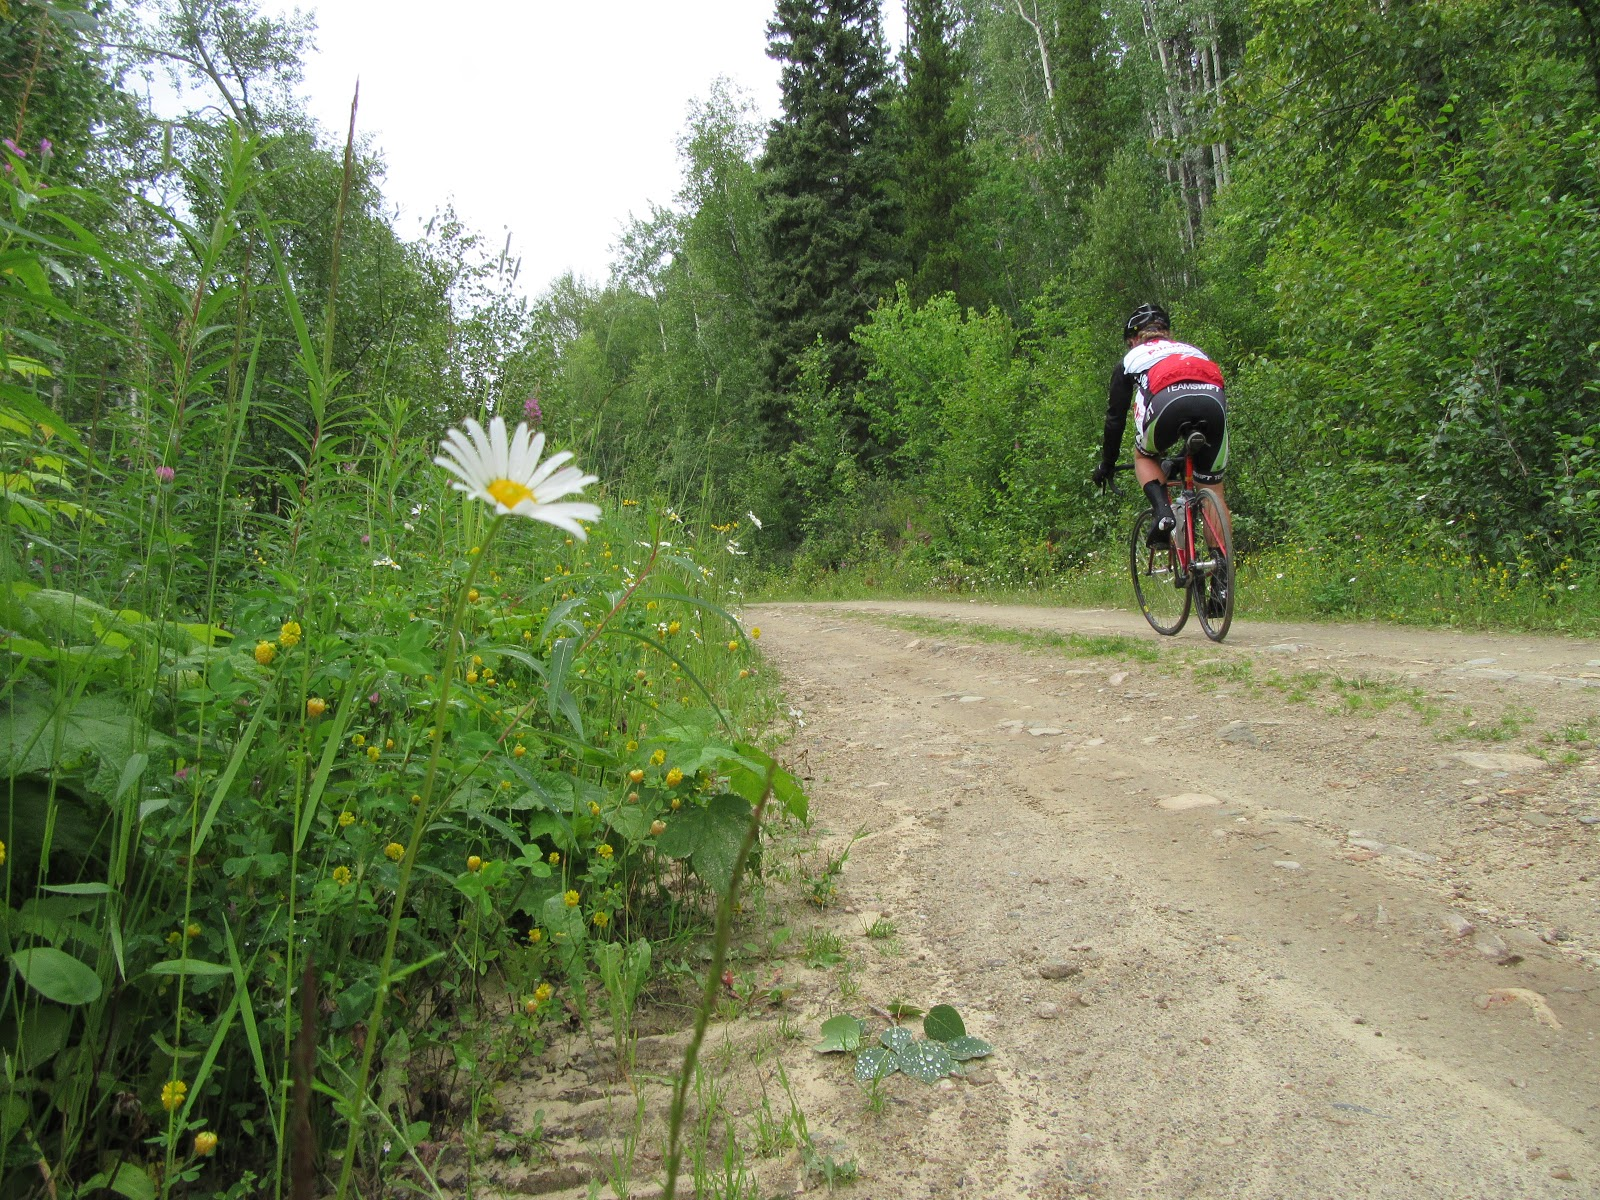 Climbing McBride Peak by bike - dirt road, flower, pjamm cycling riding bike